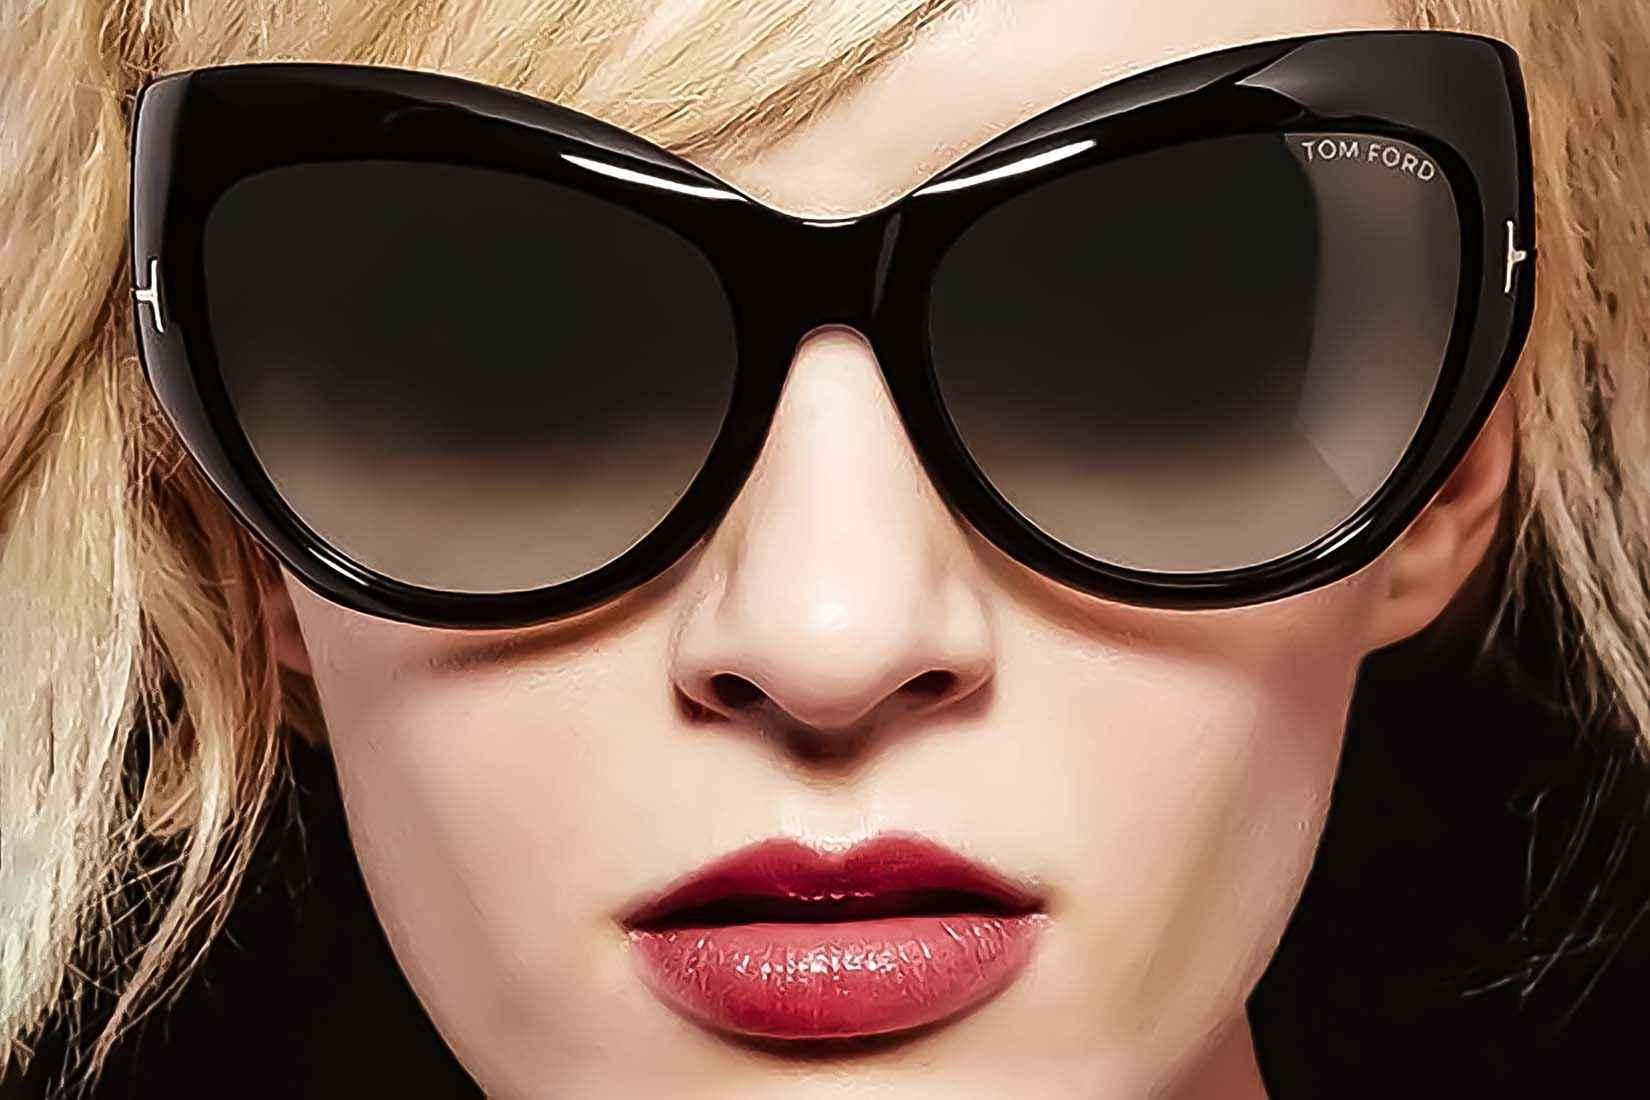 Tom Ford Sunglasses 05 1650x1100